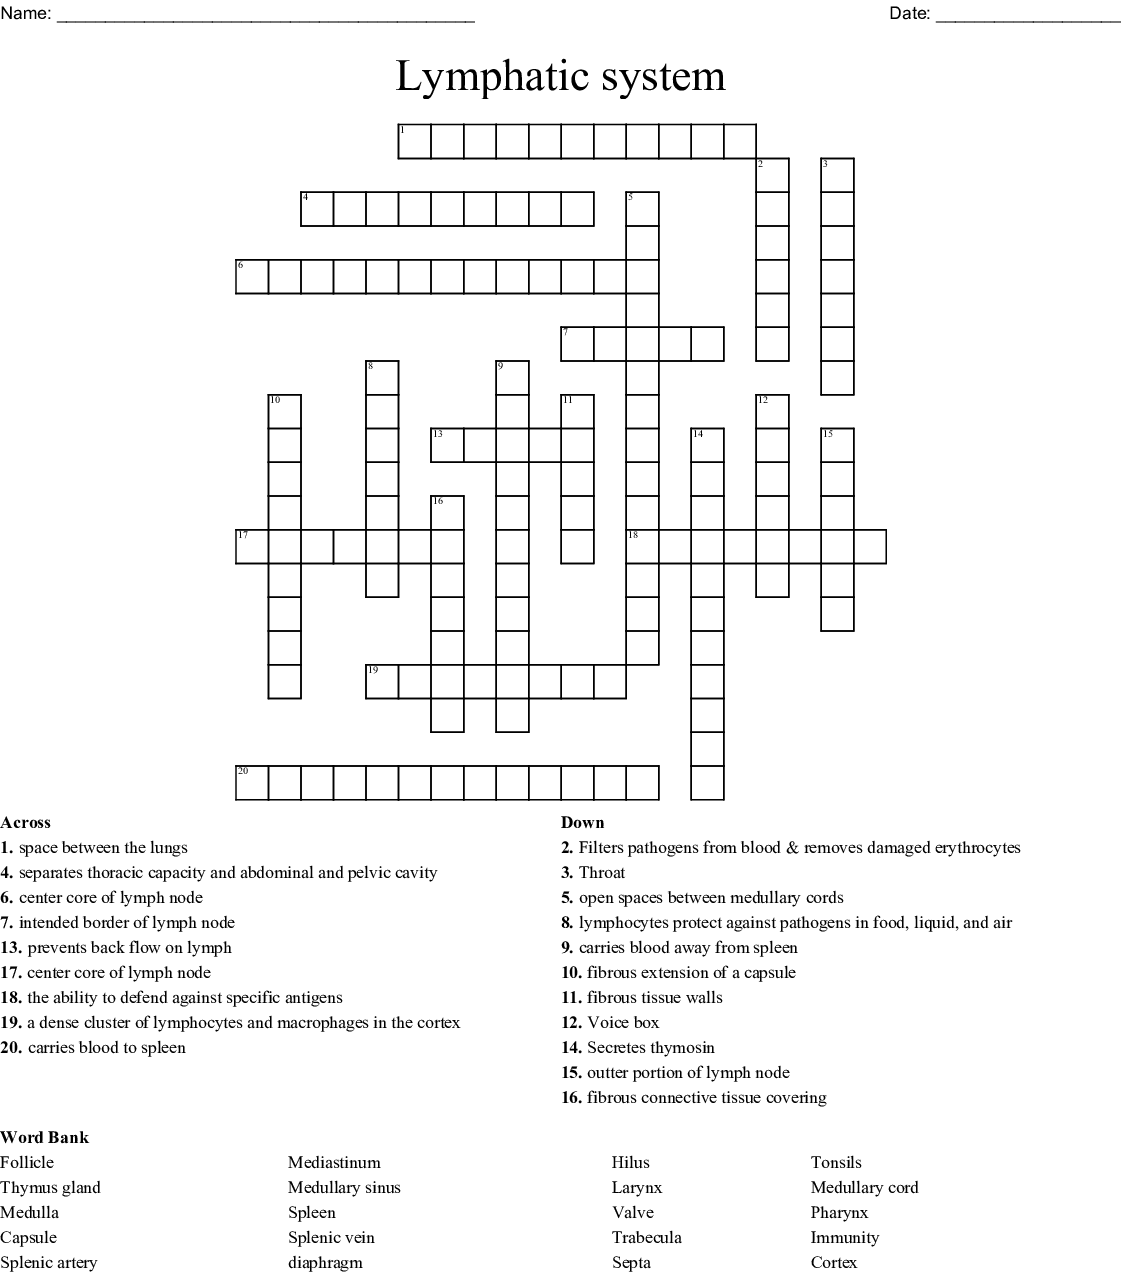 Lymphatic System Crossword